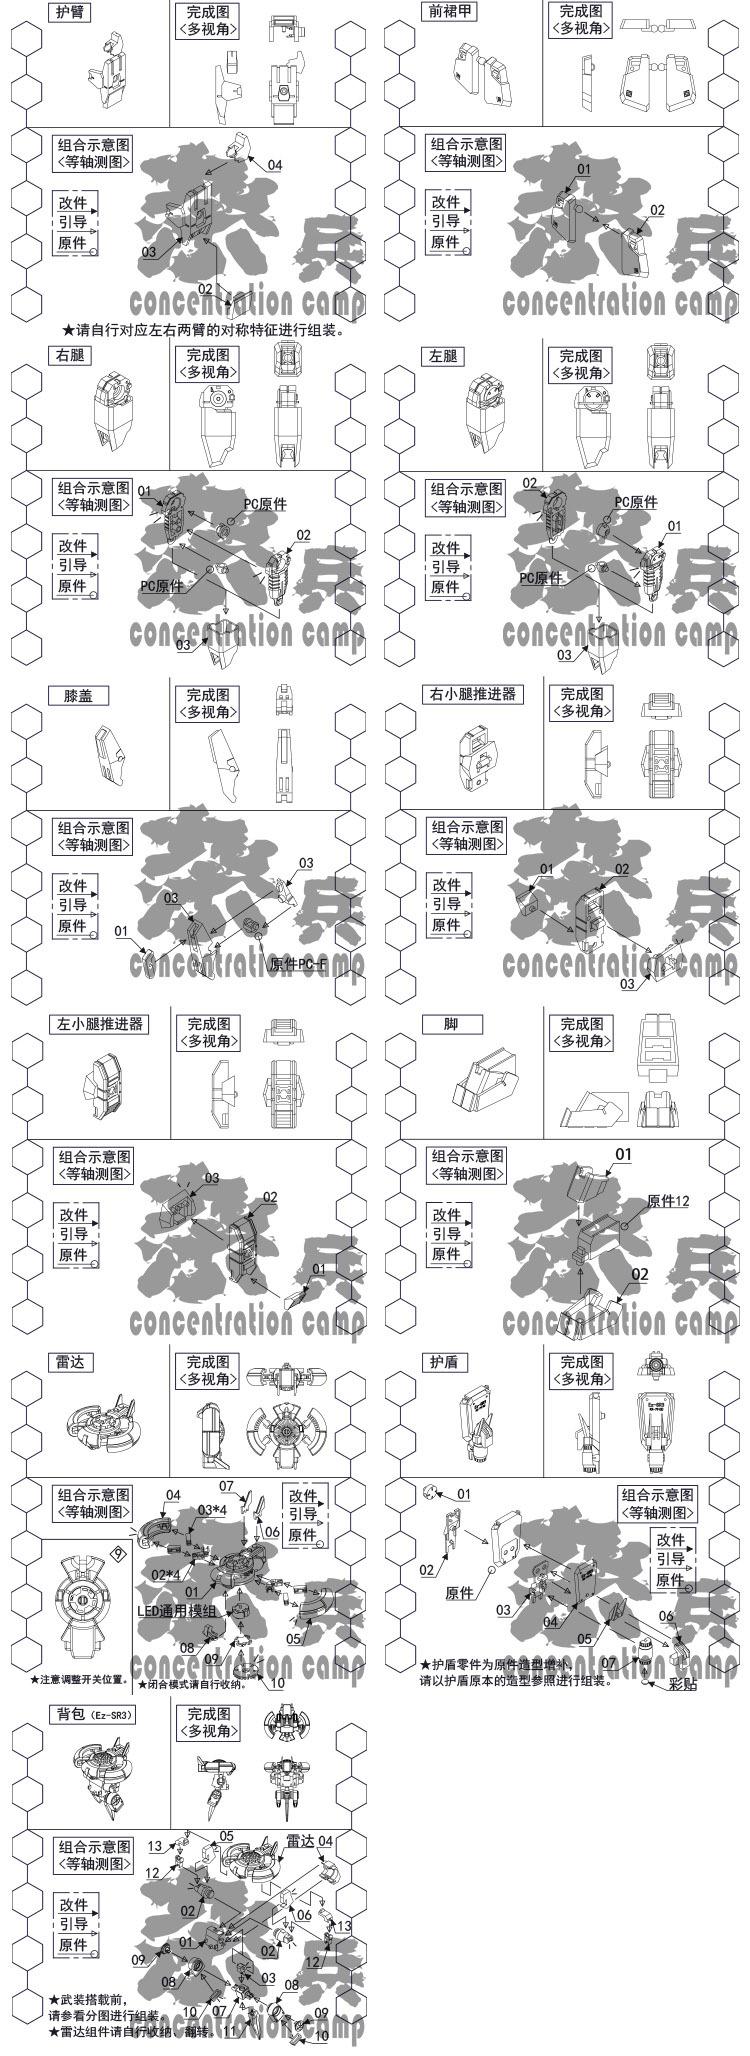 G243_Concentration_Camp_zaku_inask_022.jpg